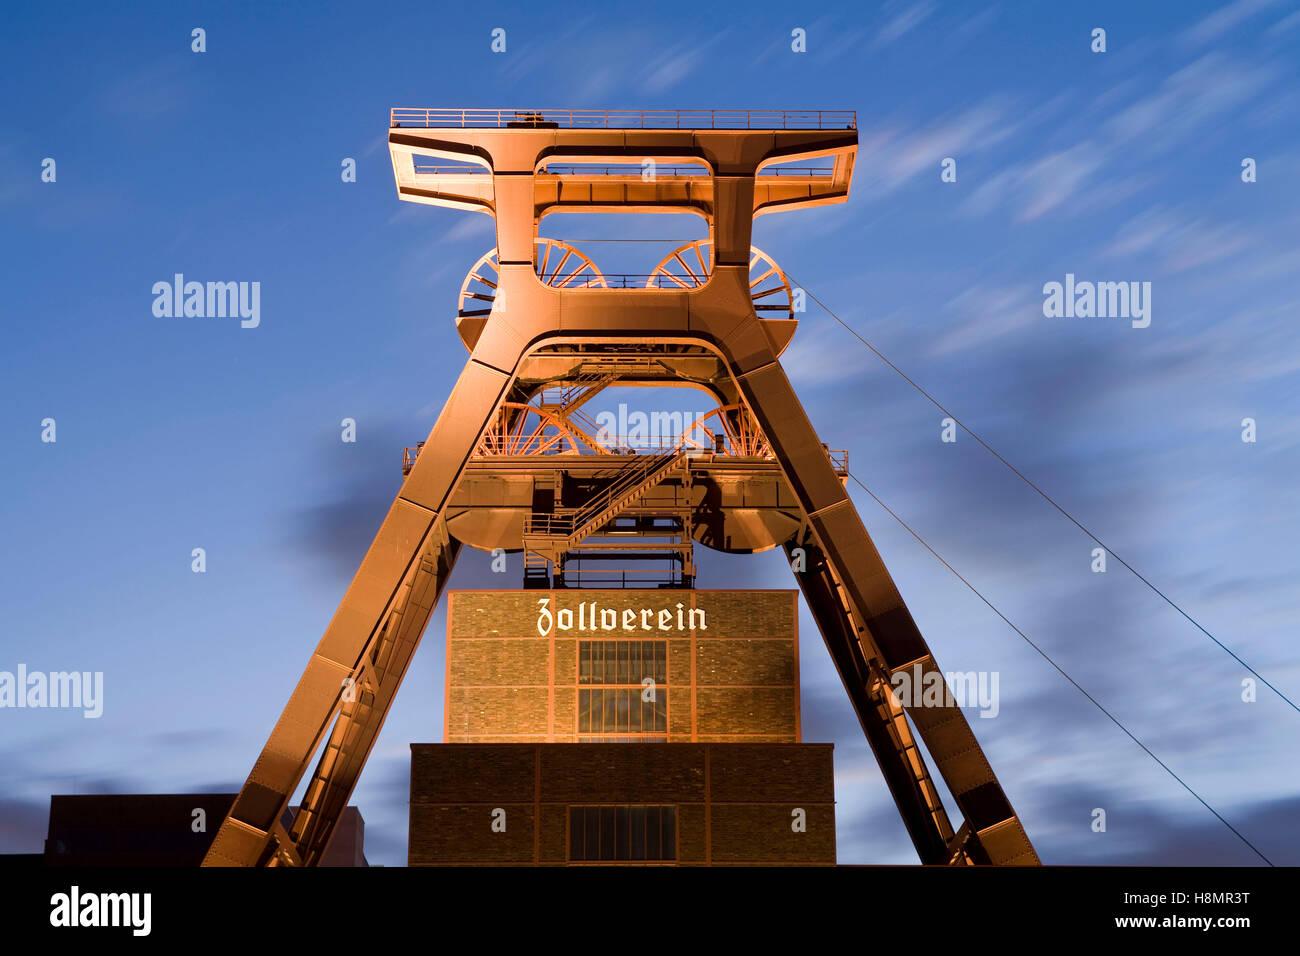 germany ruhr area essen industry monument zeche zollverein shaft stock photo royalty free. Black Bedroom Furniture Sets. Home Design Ideas